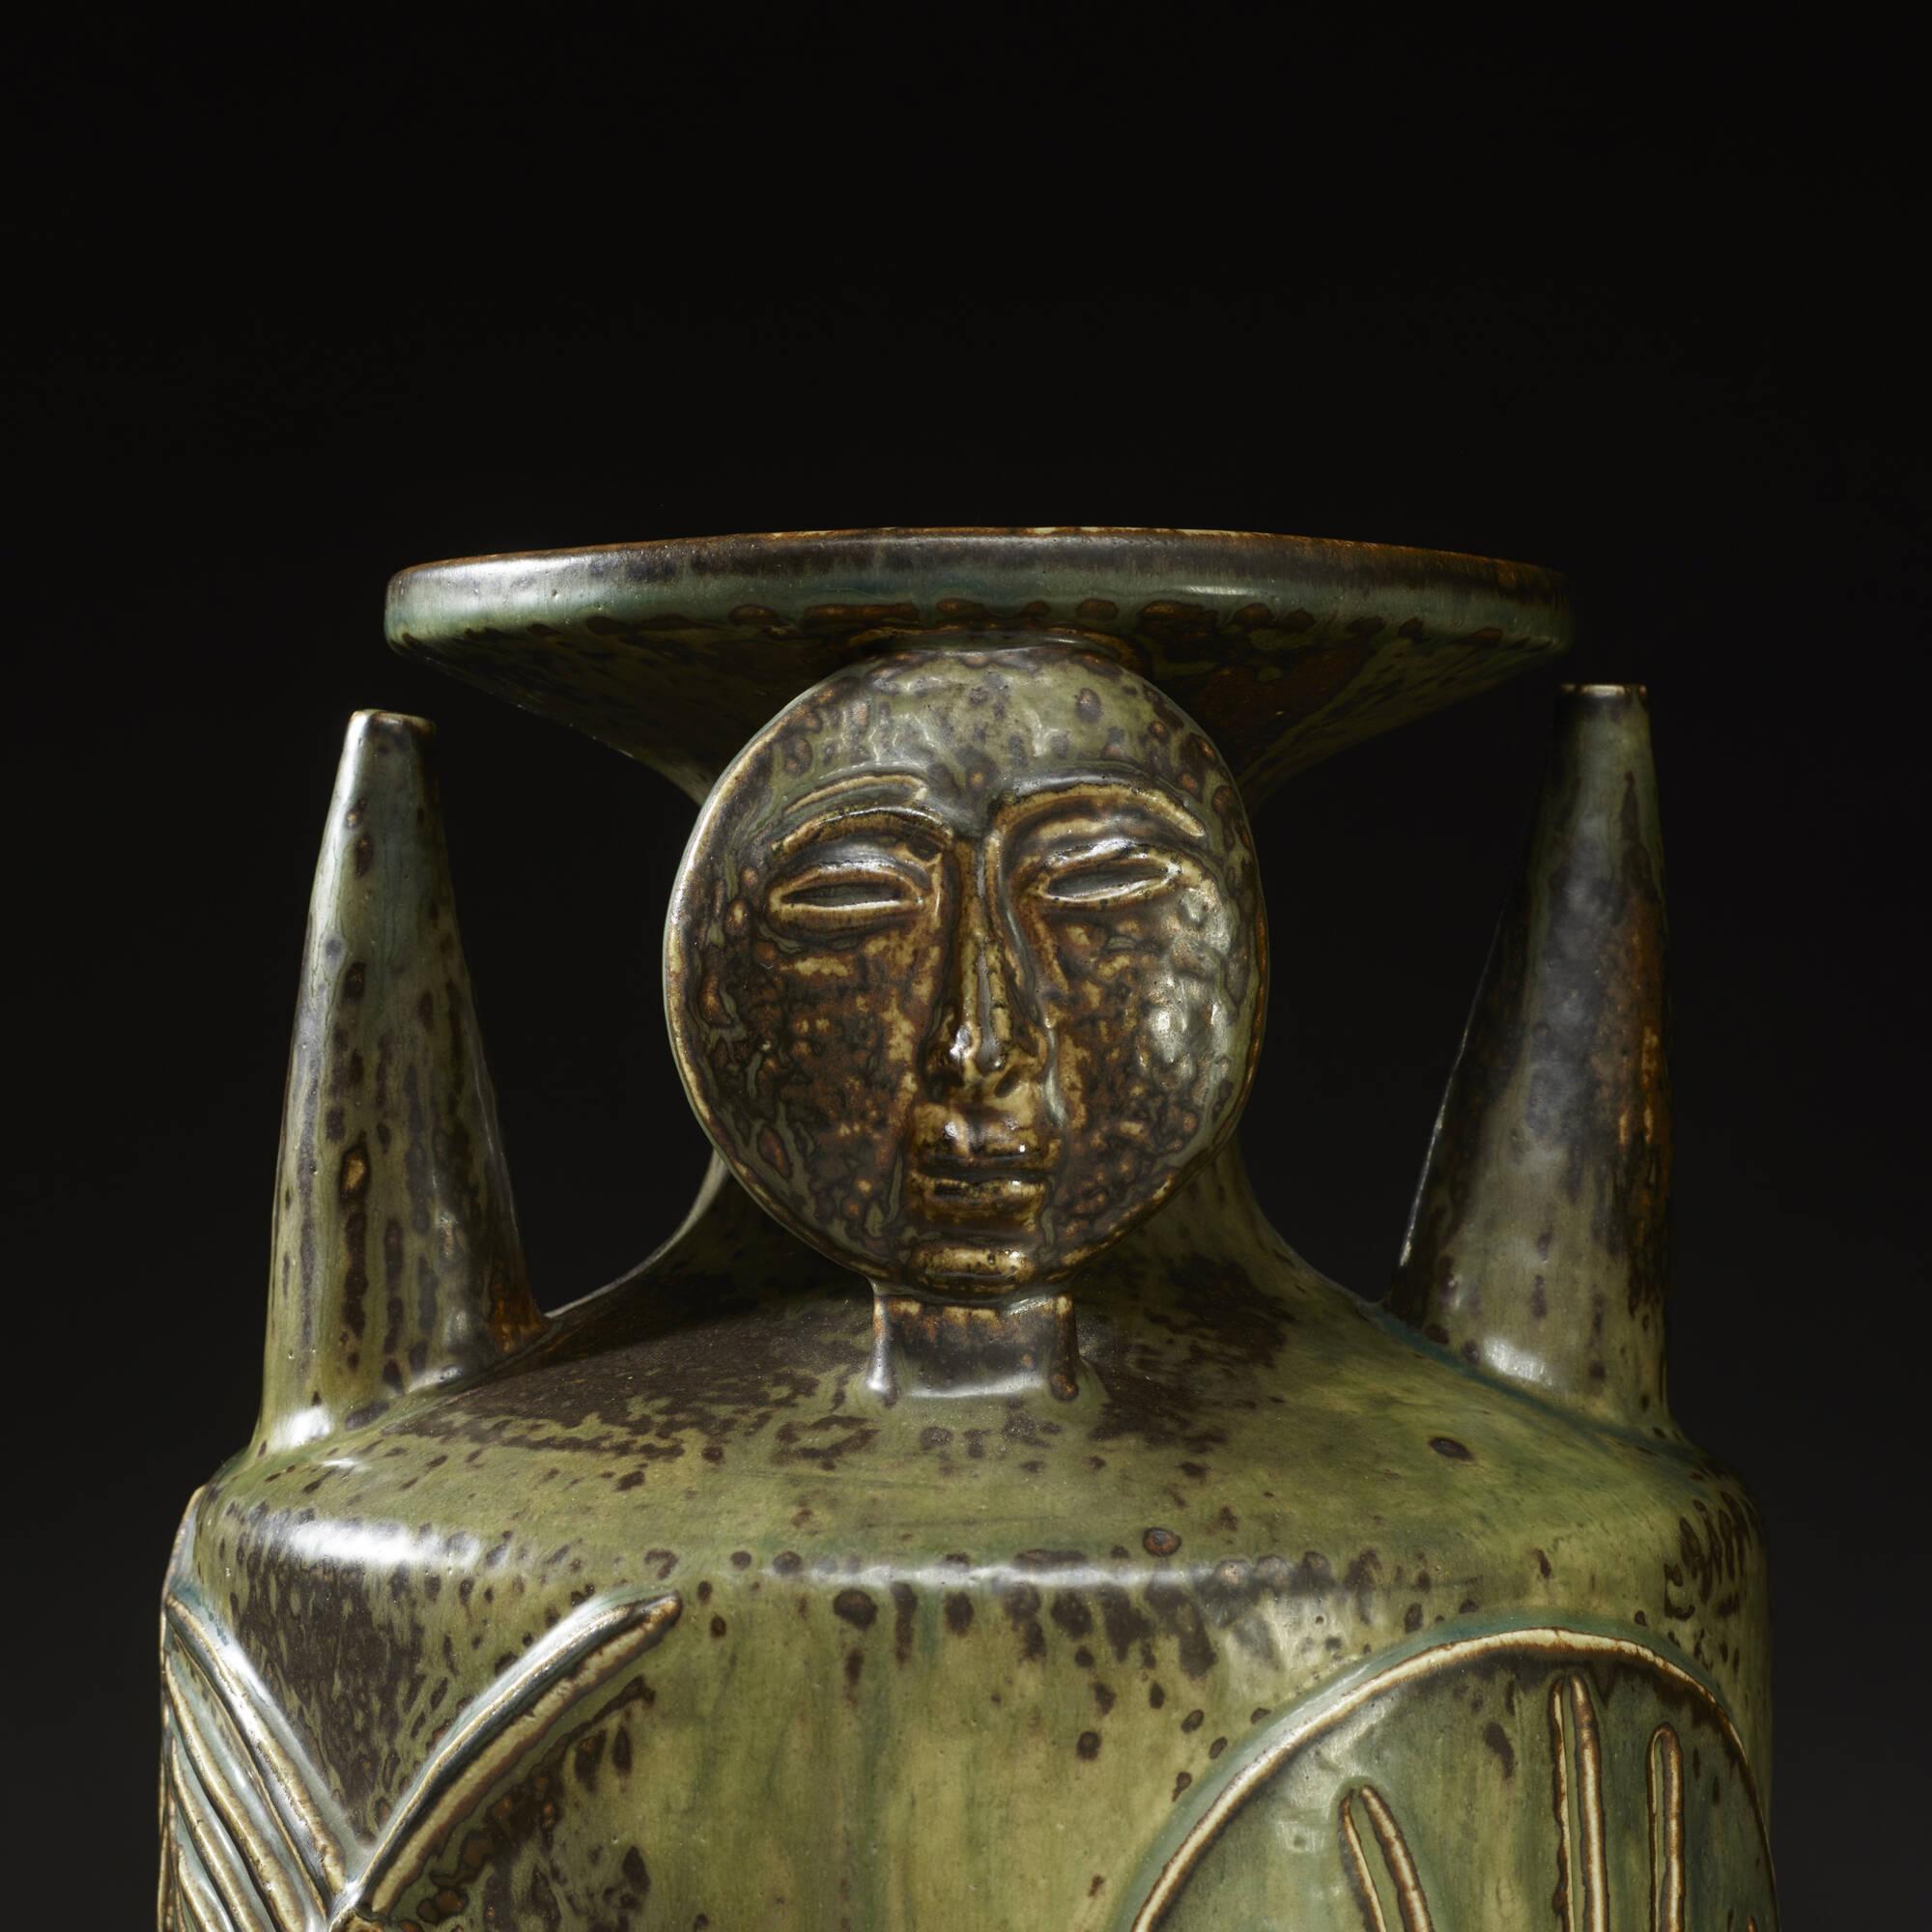 146: Axel Salto / Living Stone vase (3 of 3)